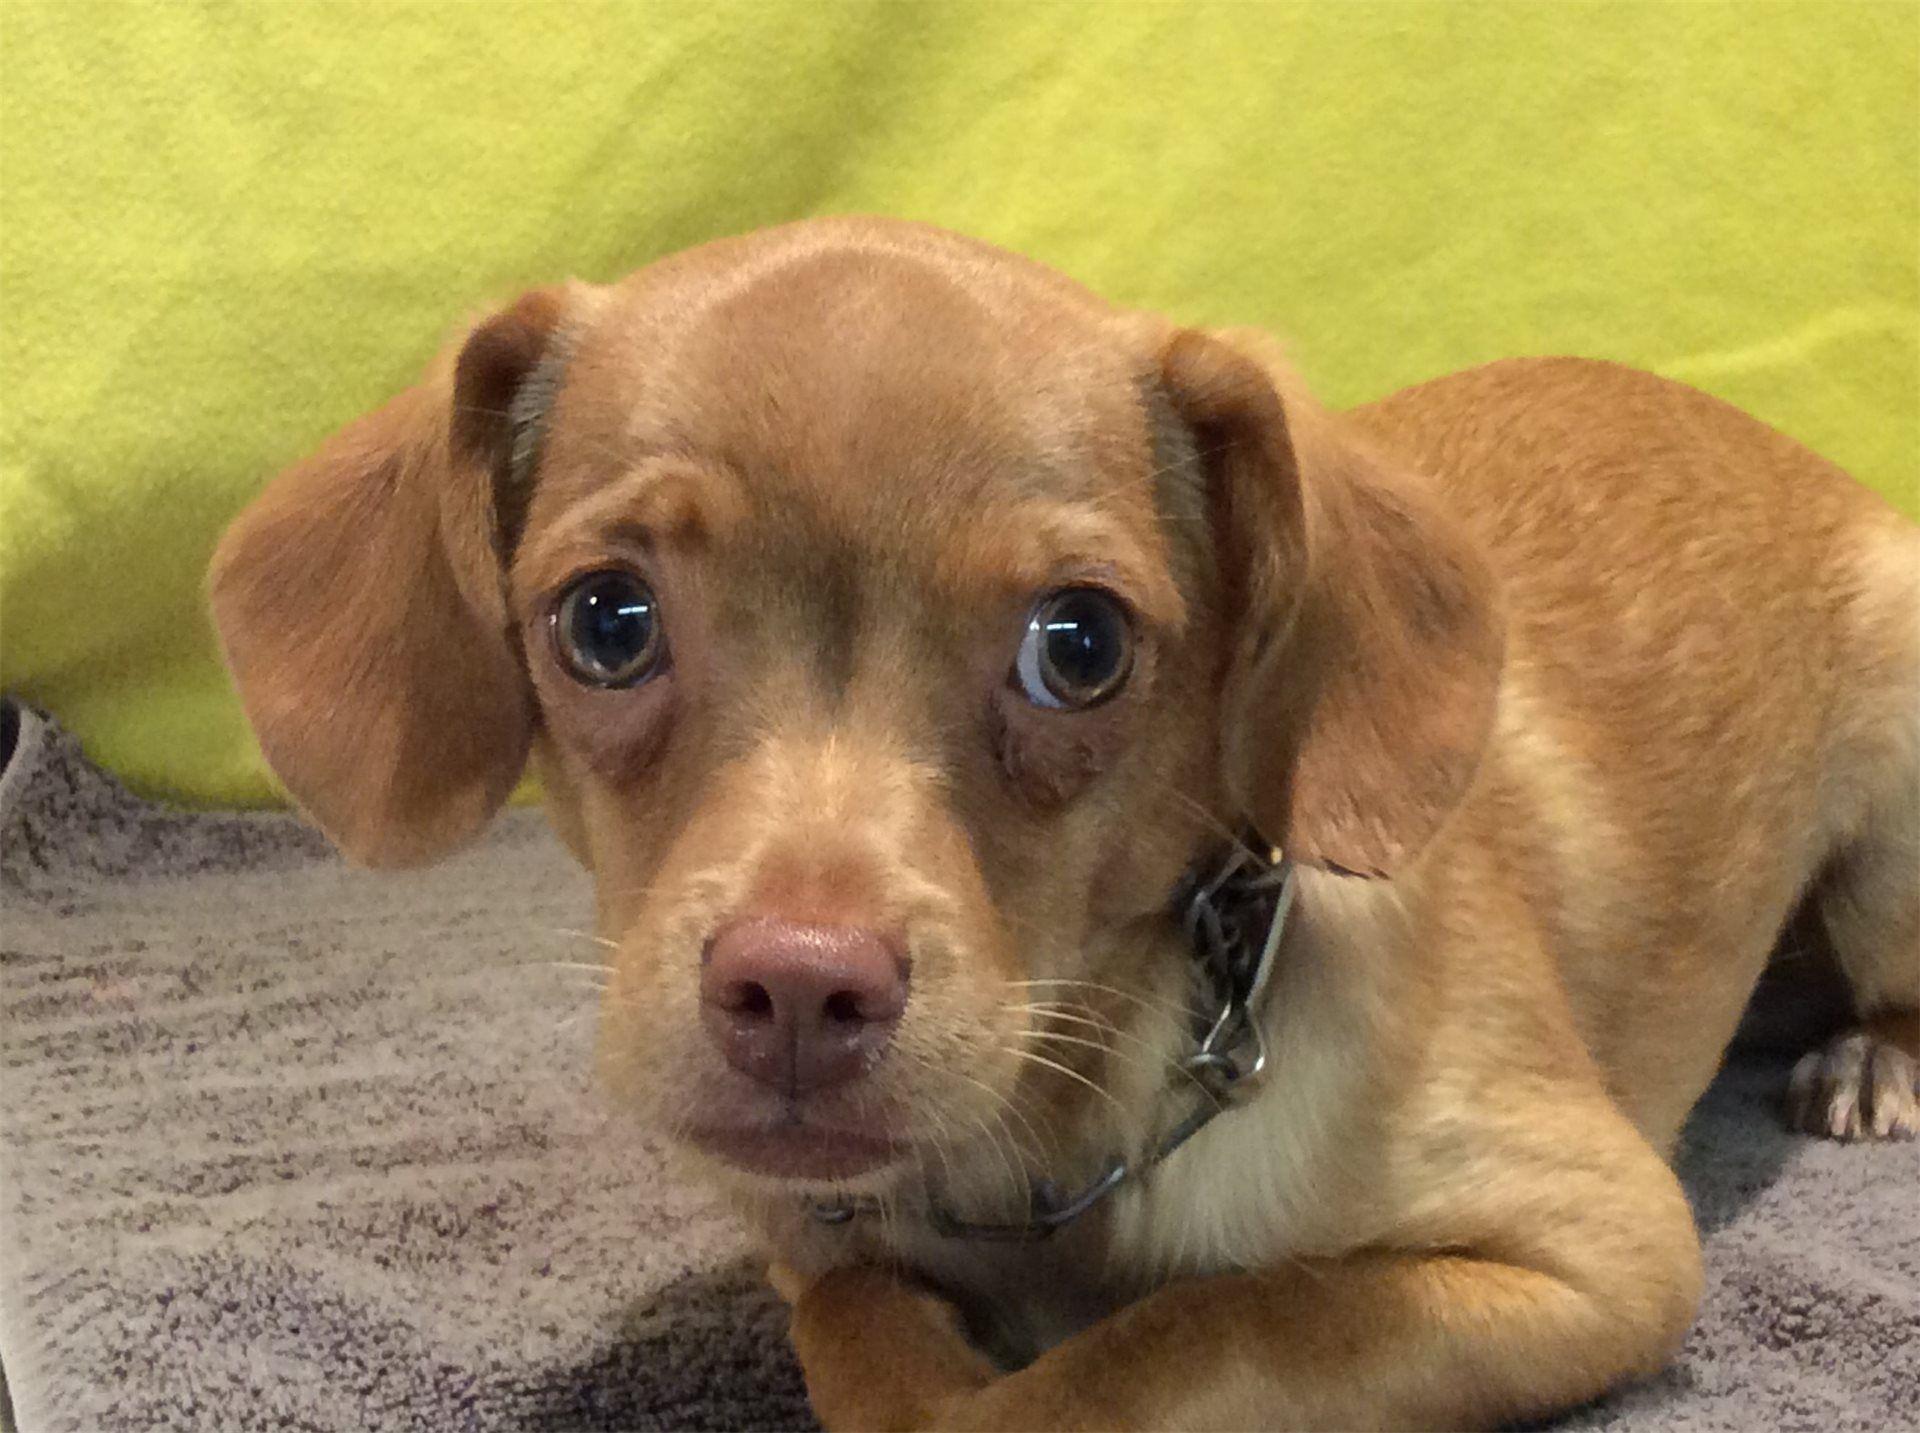 Beagle dog for Adoption in pomona, CA. ADN532617 on